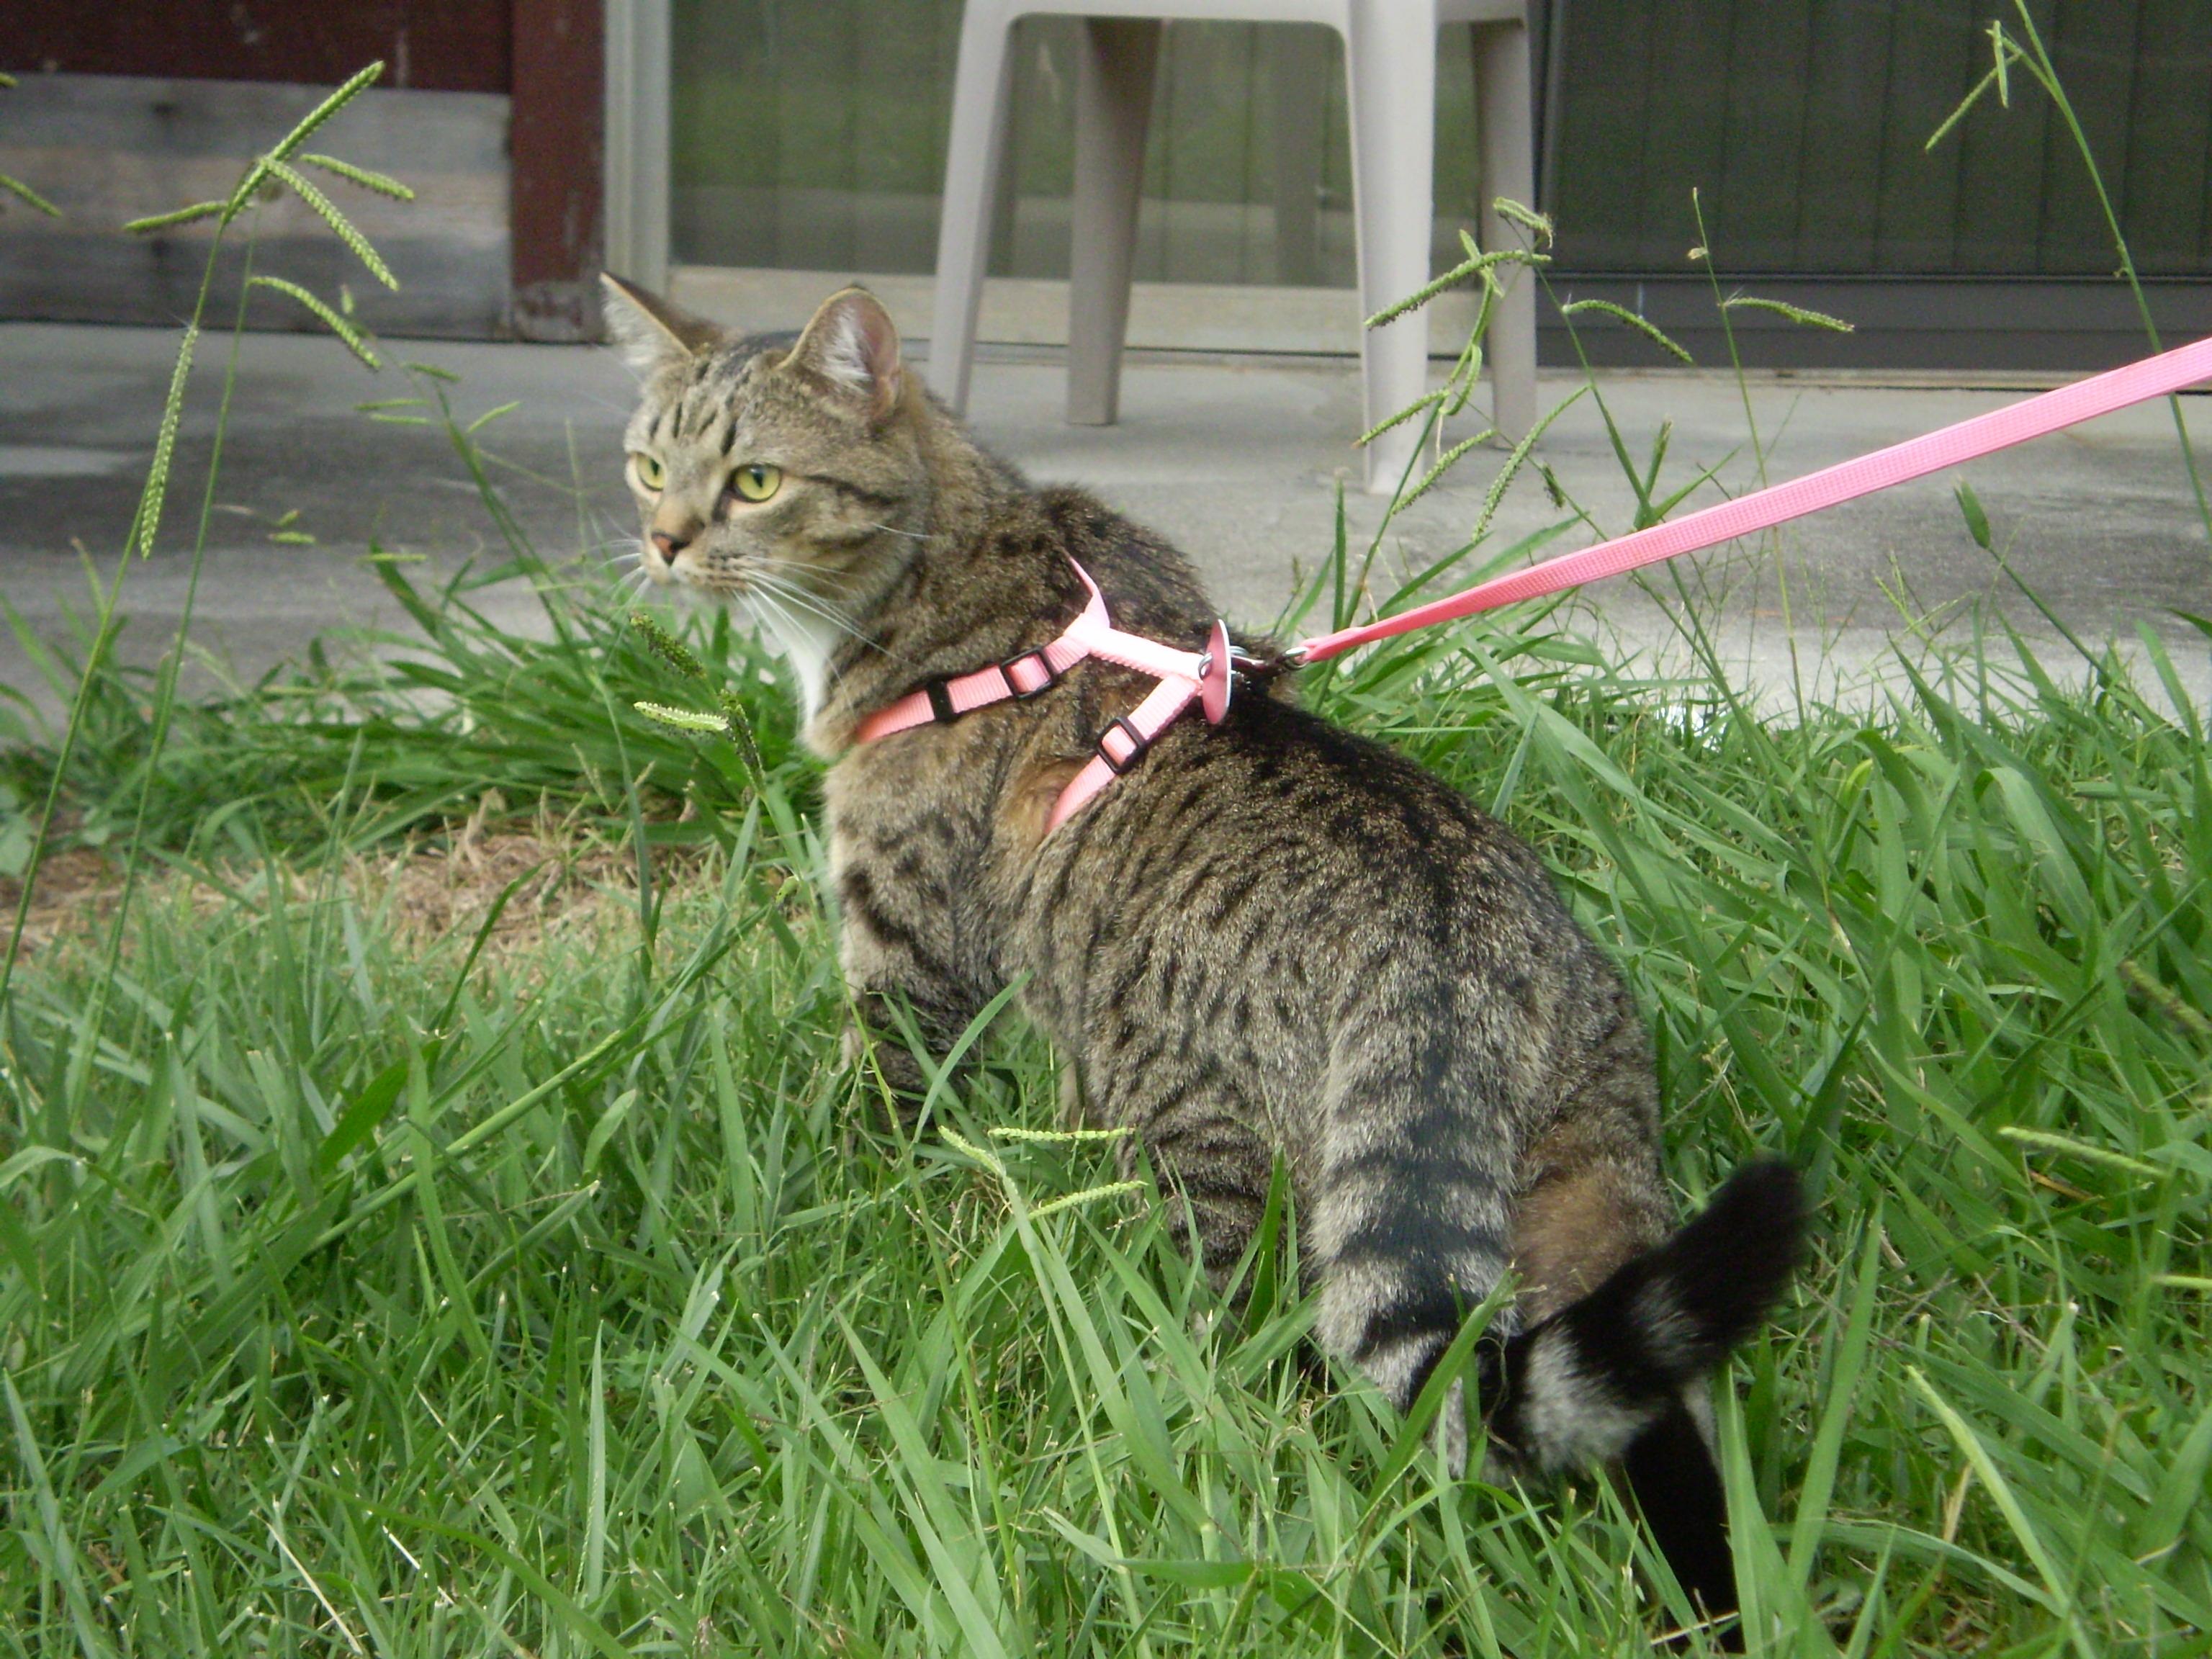 Resulta que puedes sacar a pasear a tu gato